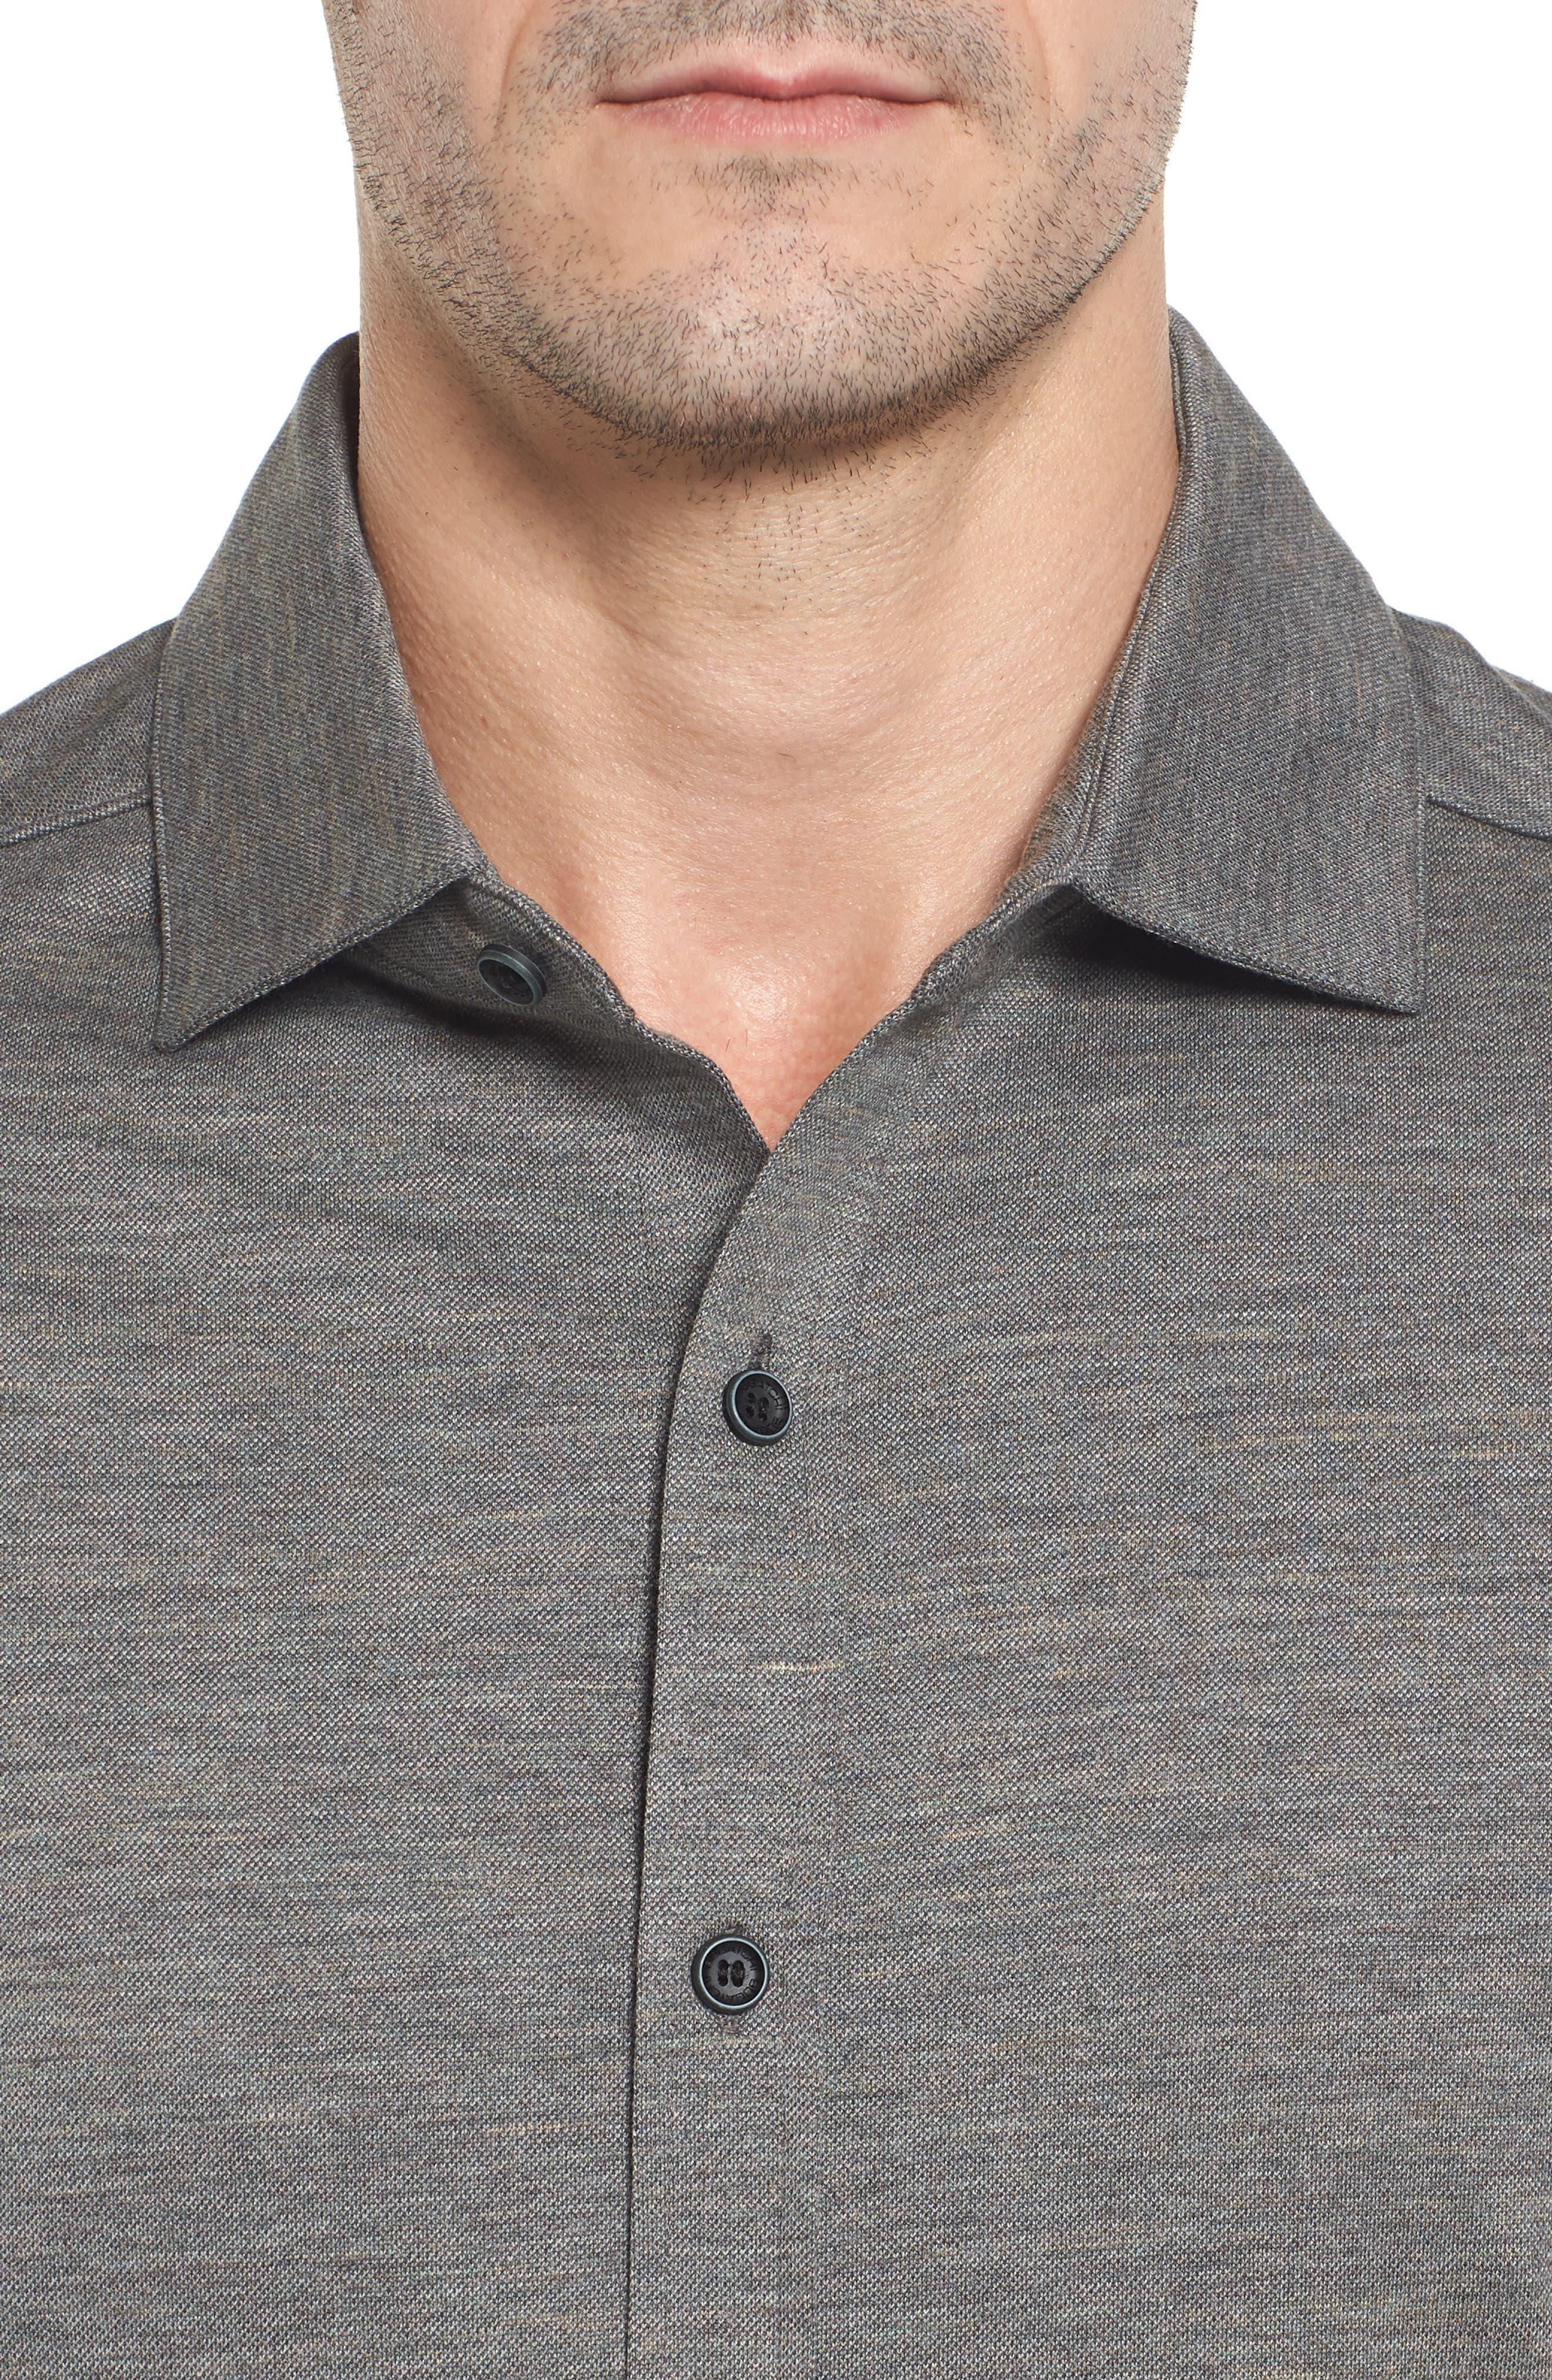 Regular Fit Piqué Knit Sport Shirt,                             Alternate thumbnail 4, color,                             020